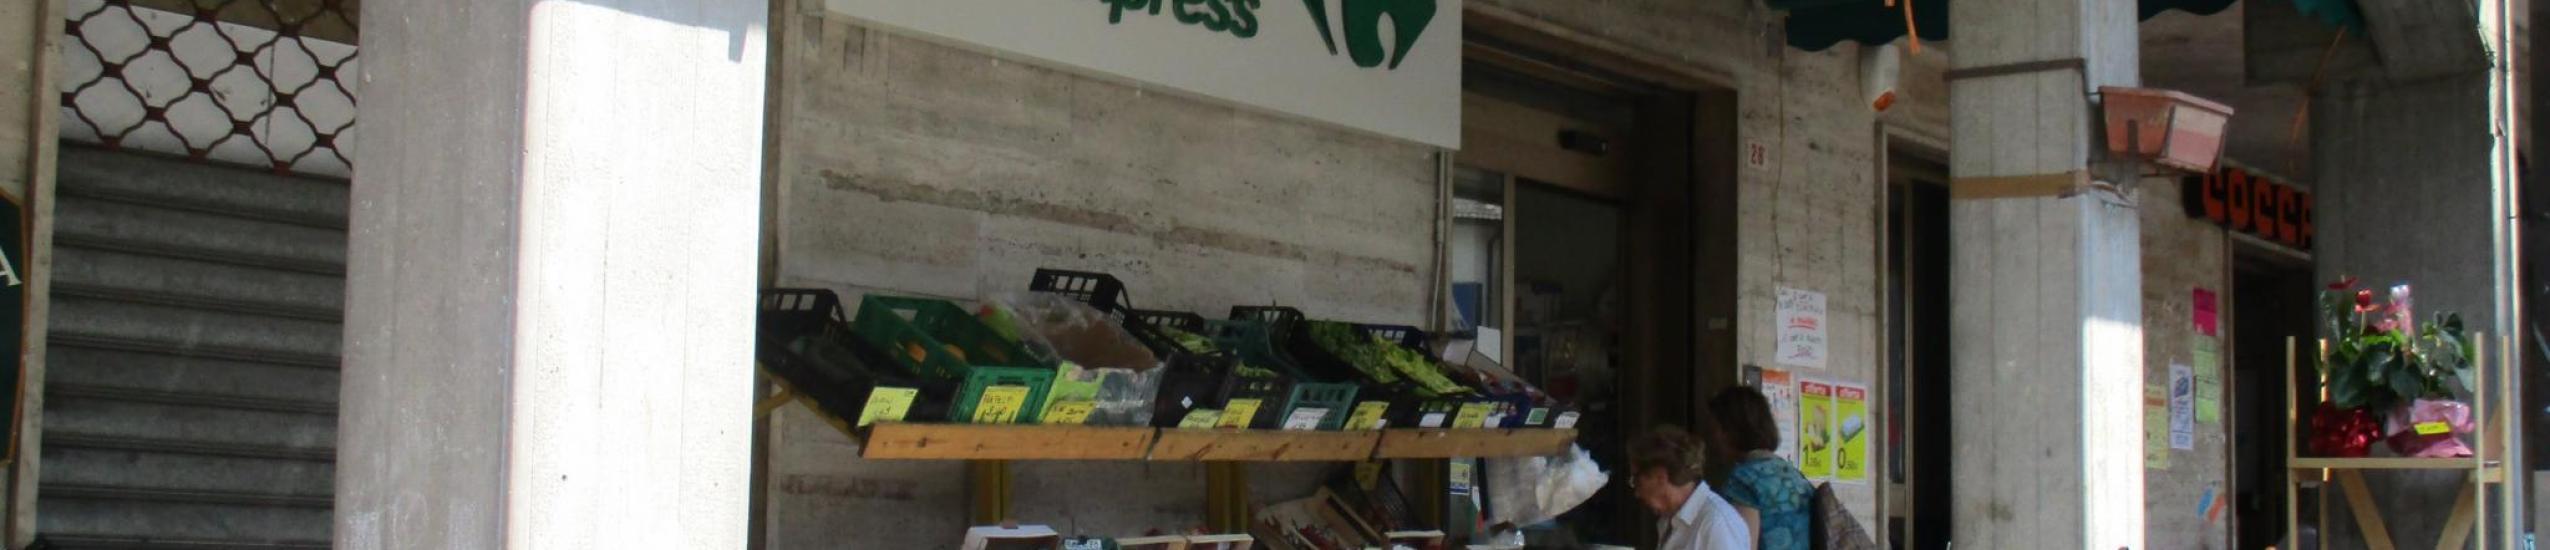 Supermercato Carrefour Express